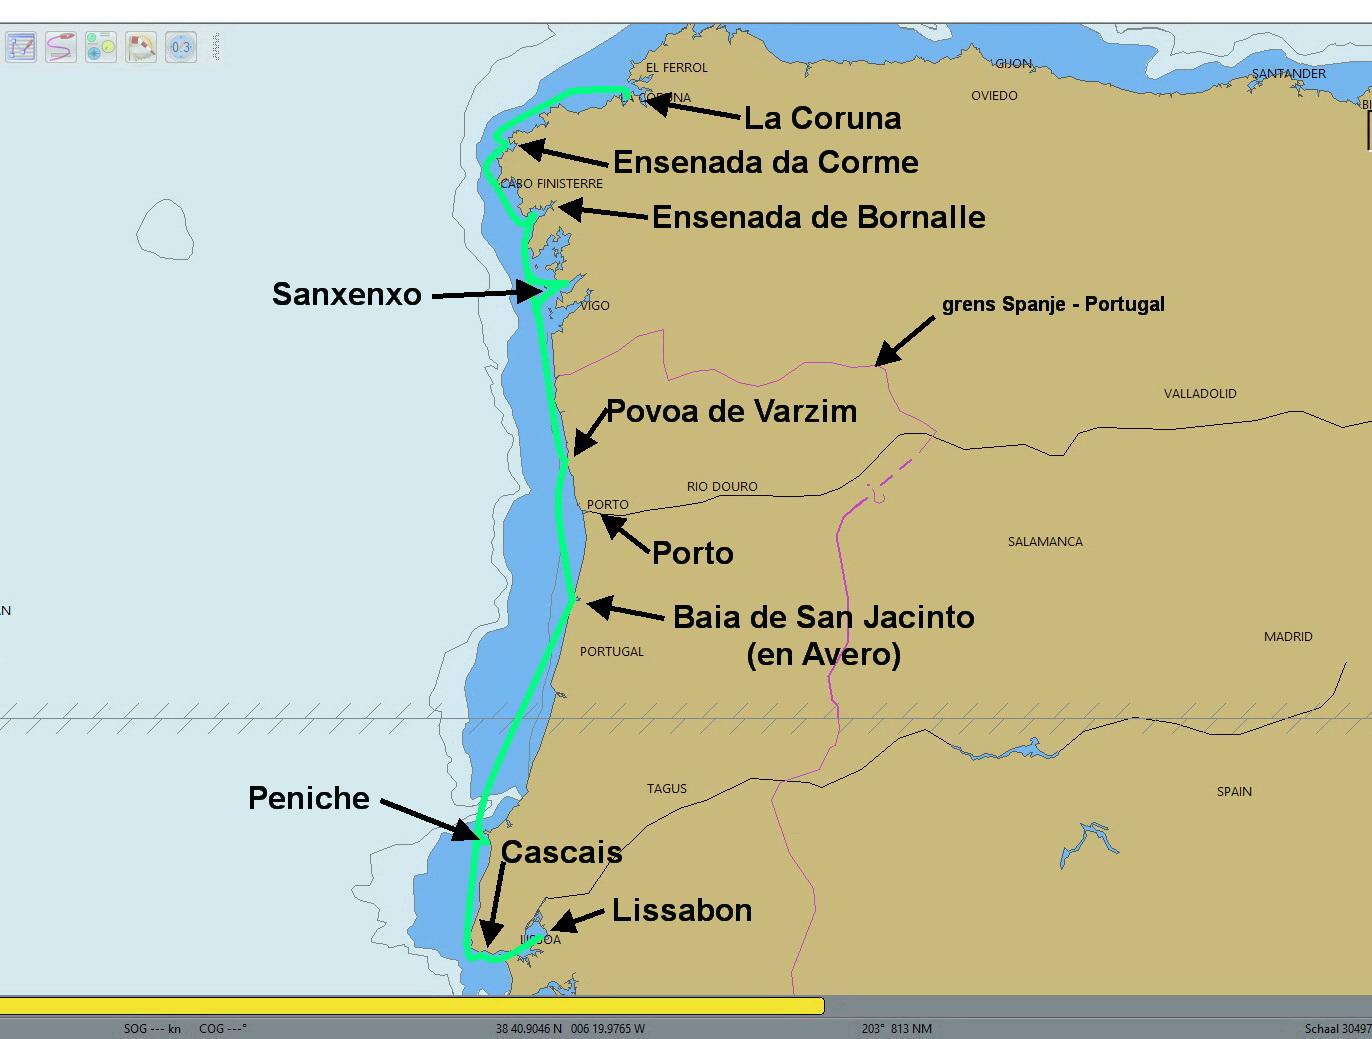 Van La Coruna naar Lissabon